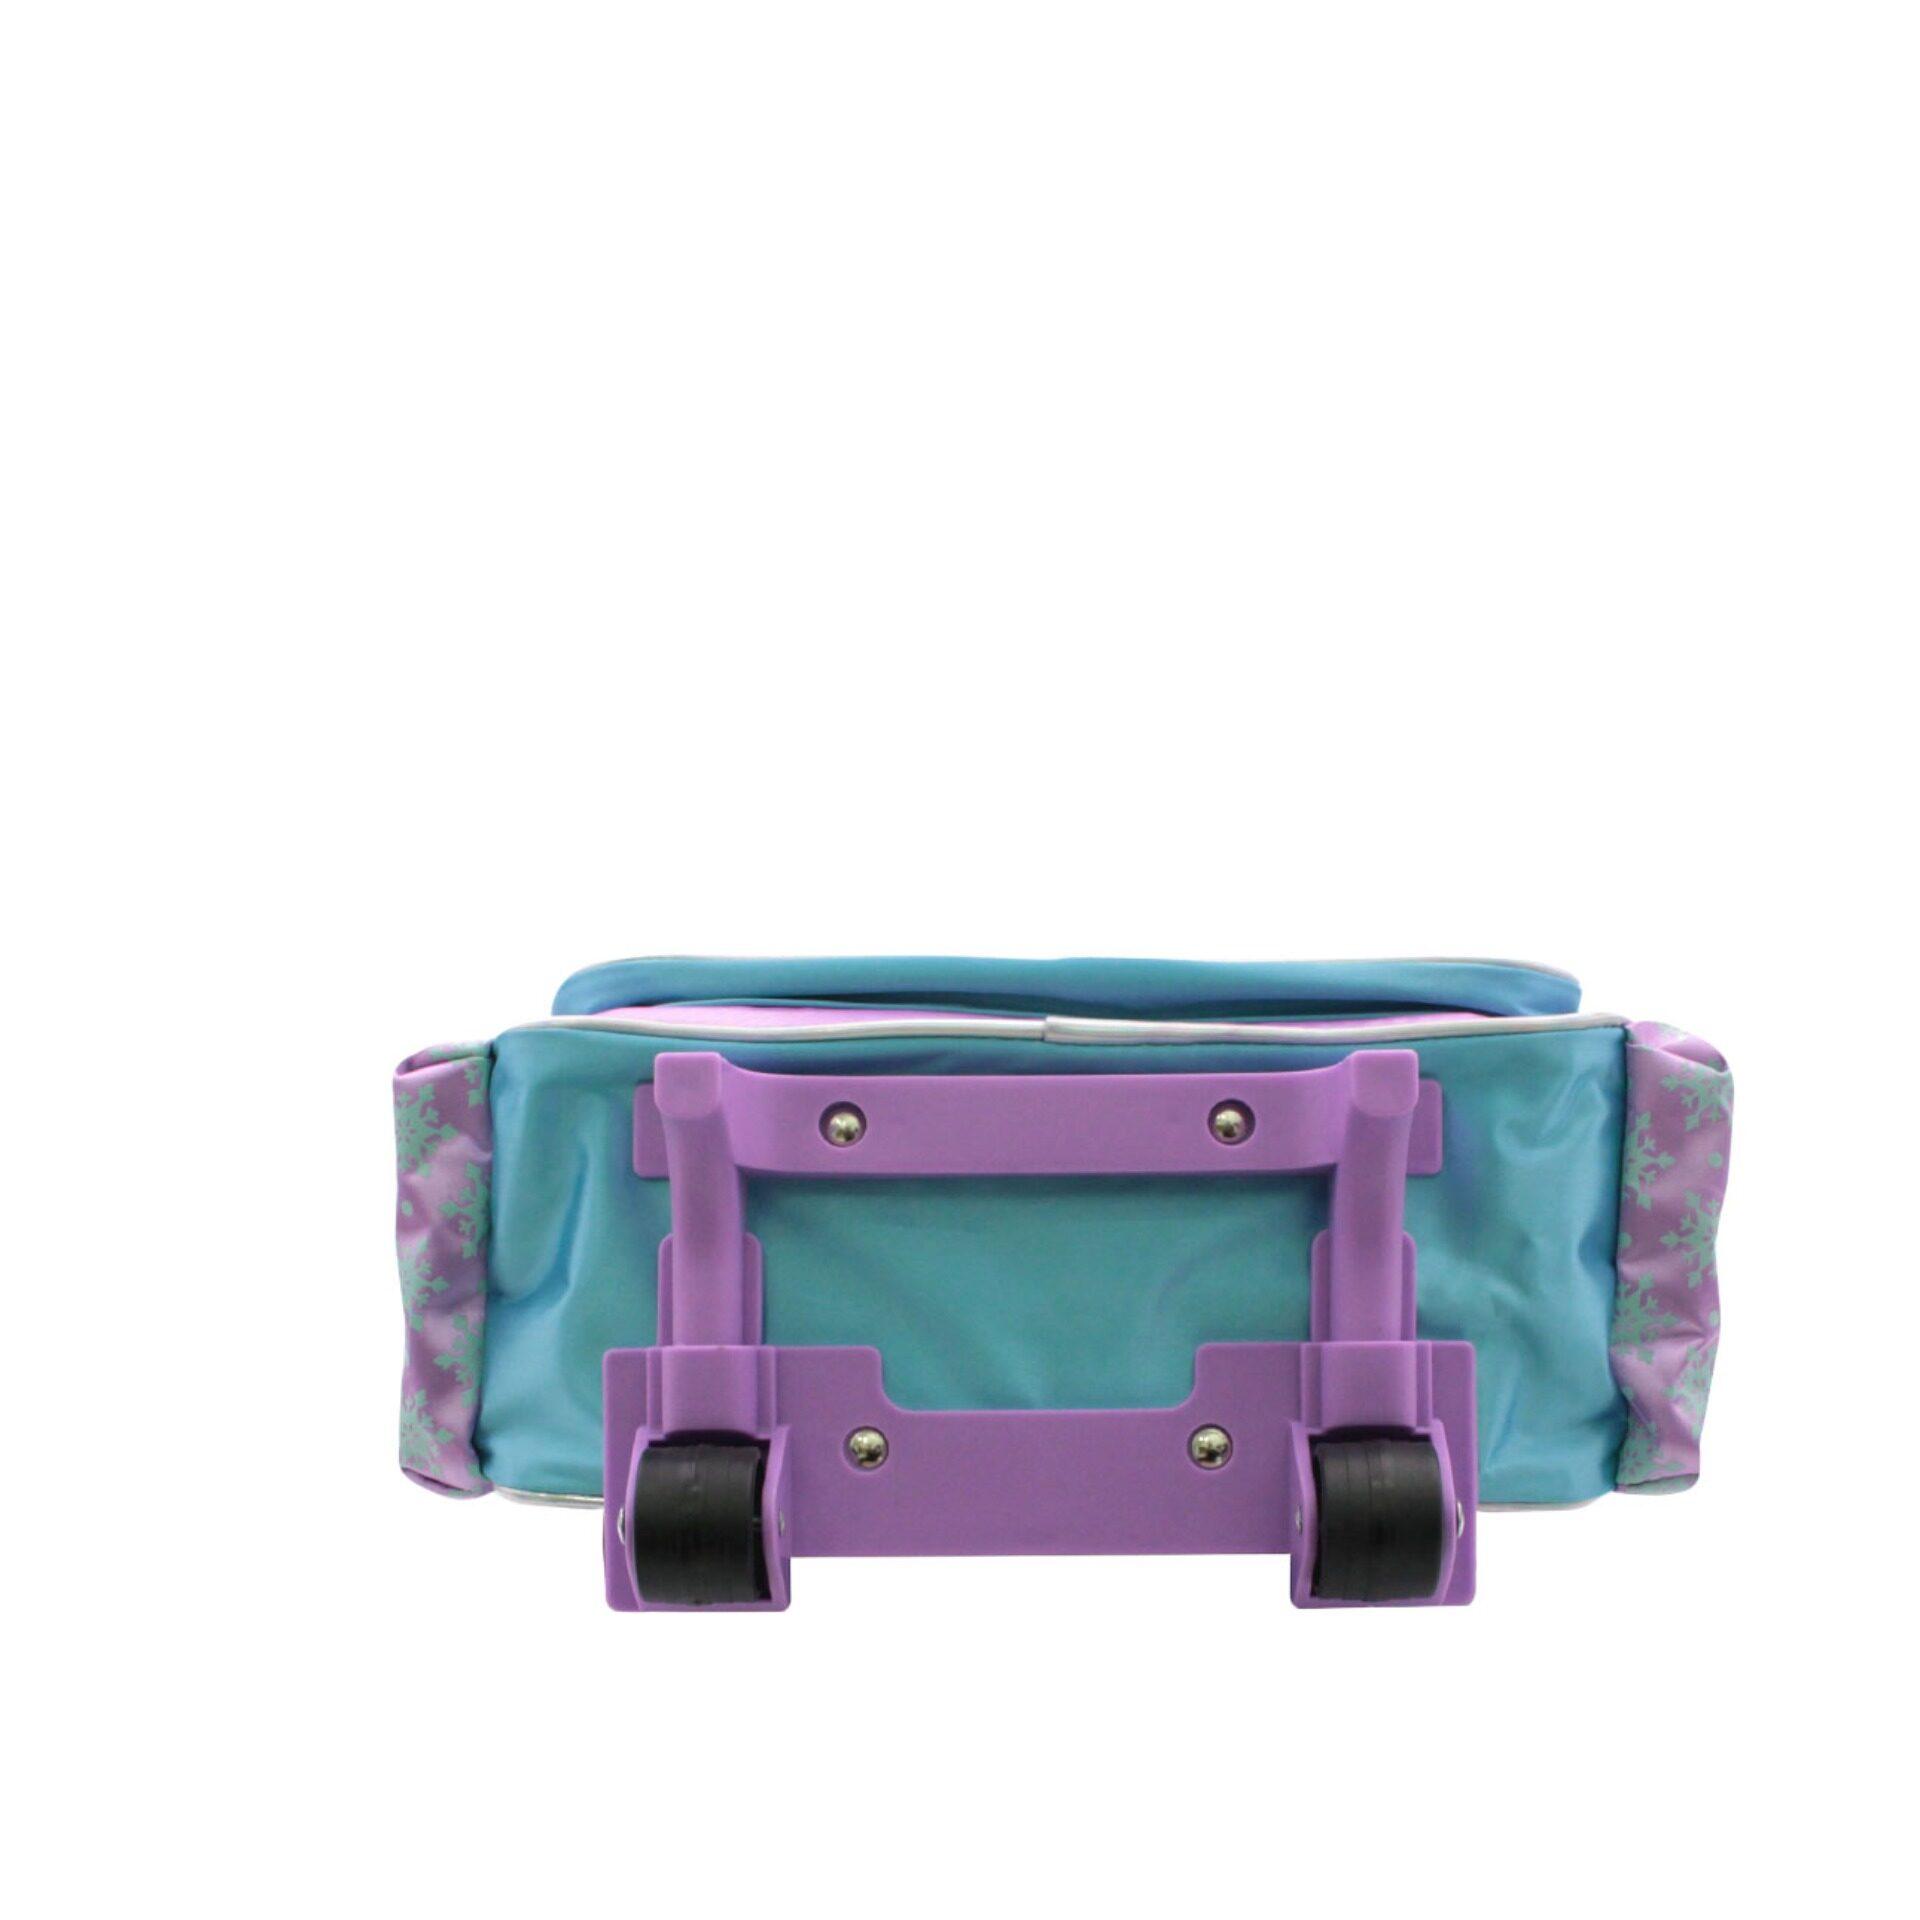 Disney Frozen 2 Princess Elsa Anna & Olaf Trolley Bag with 2 Wheels (Light Purple & Blue) (Age 9 & Above)